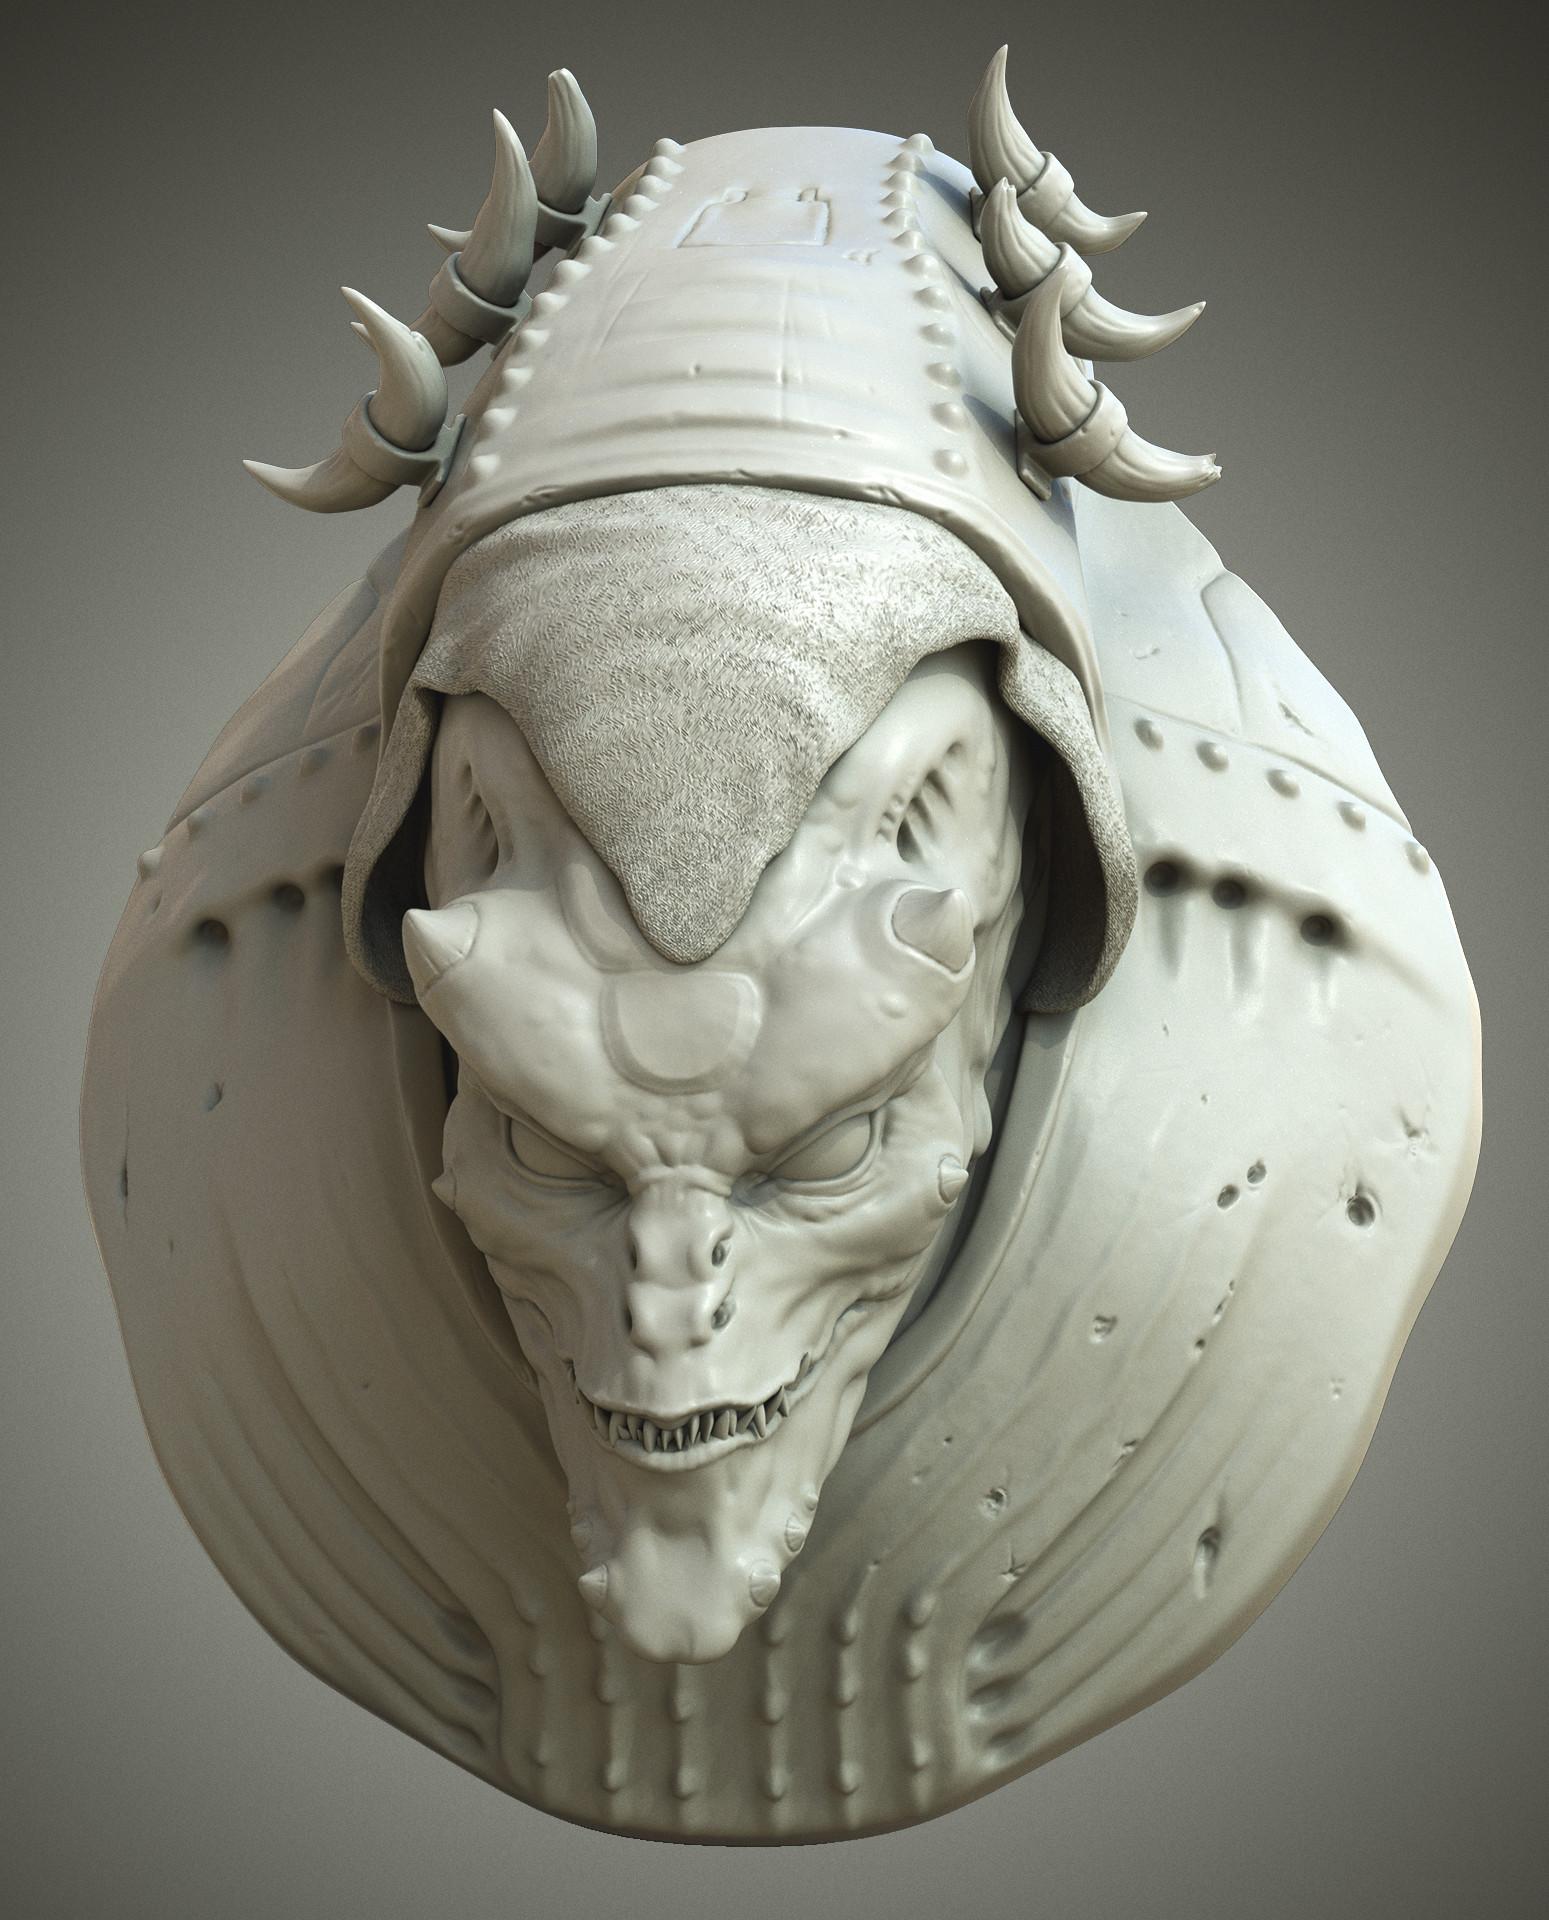 Panos cheliotis alien bust